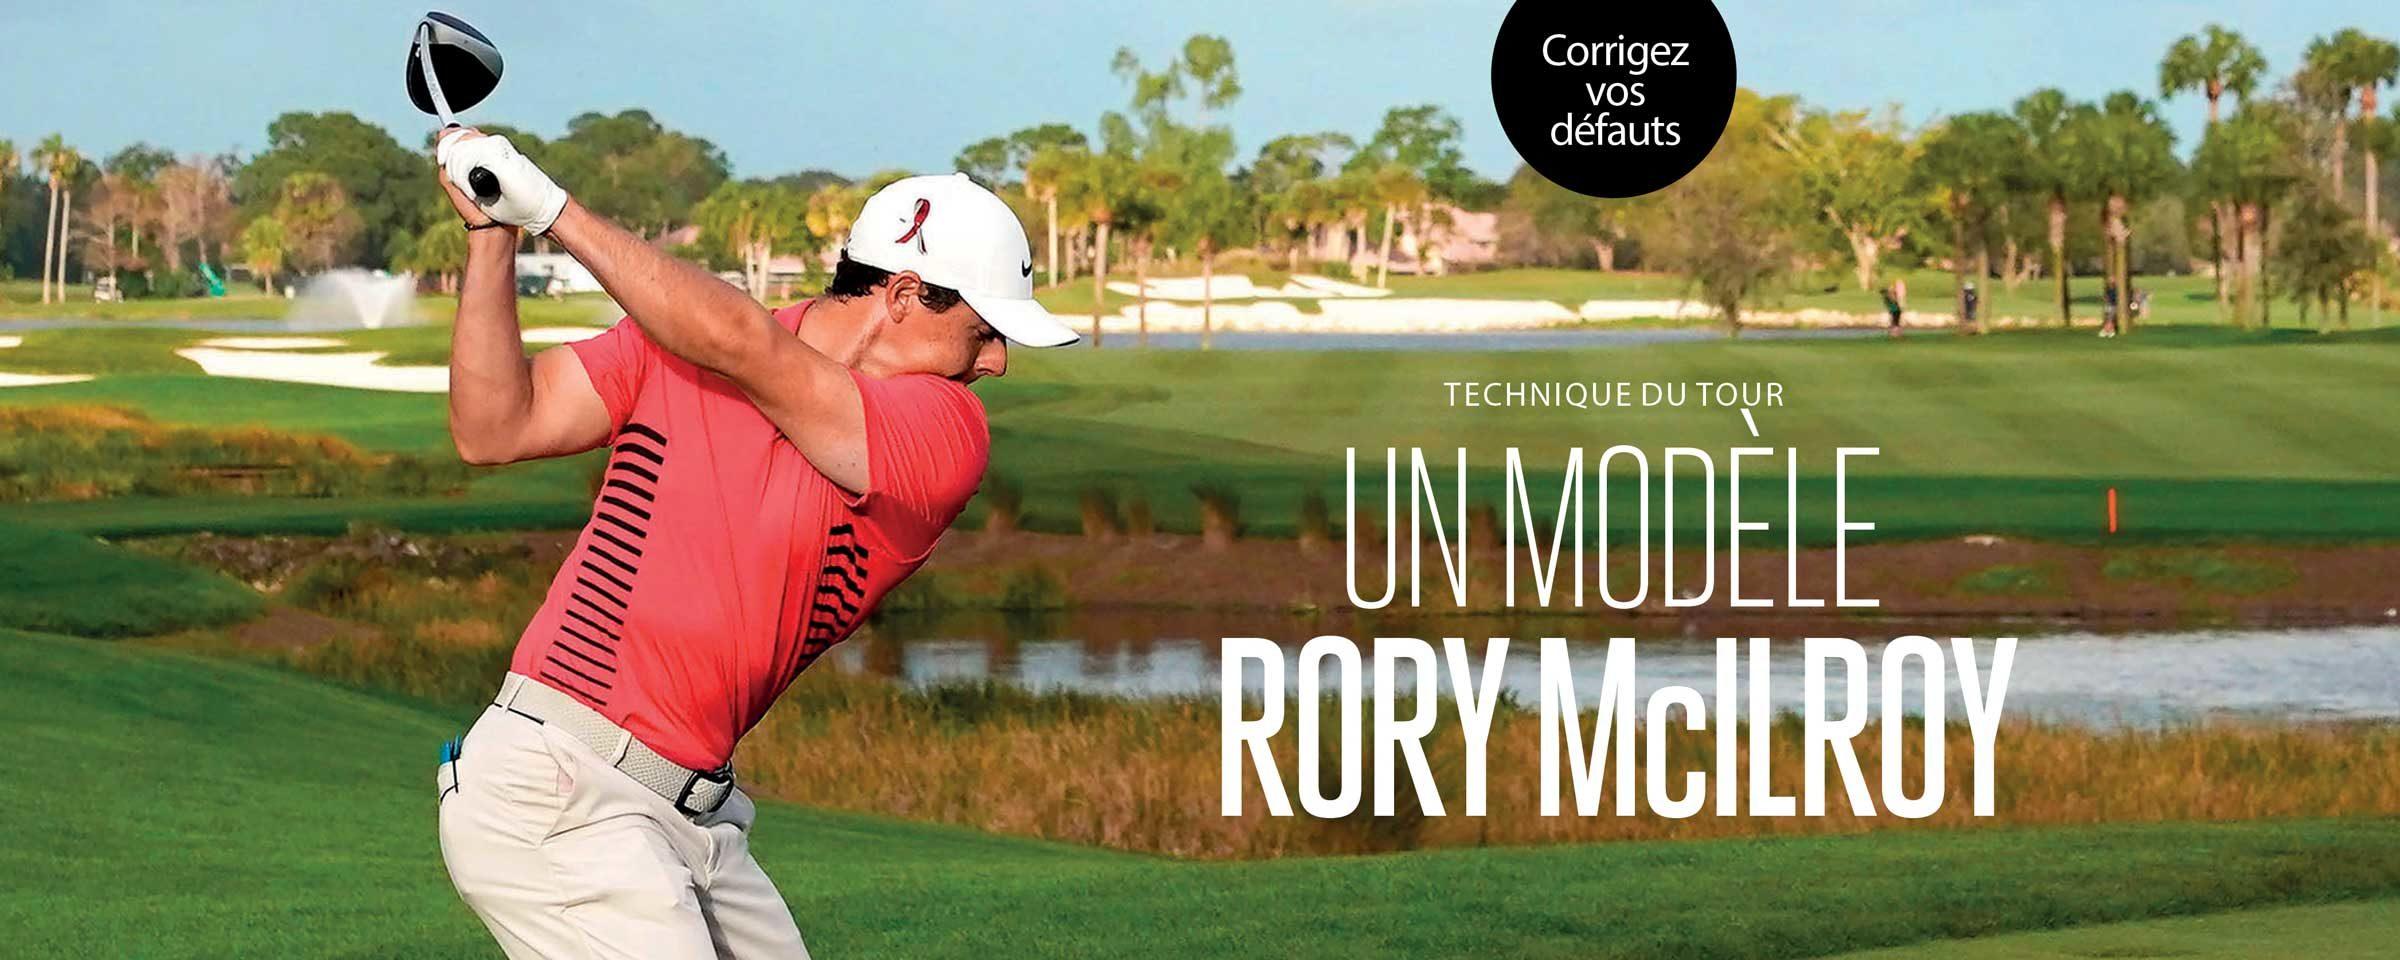 Un modèle Rory McIlroy